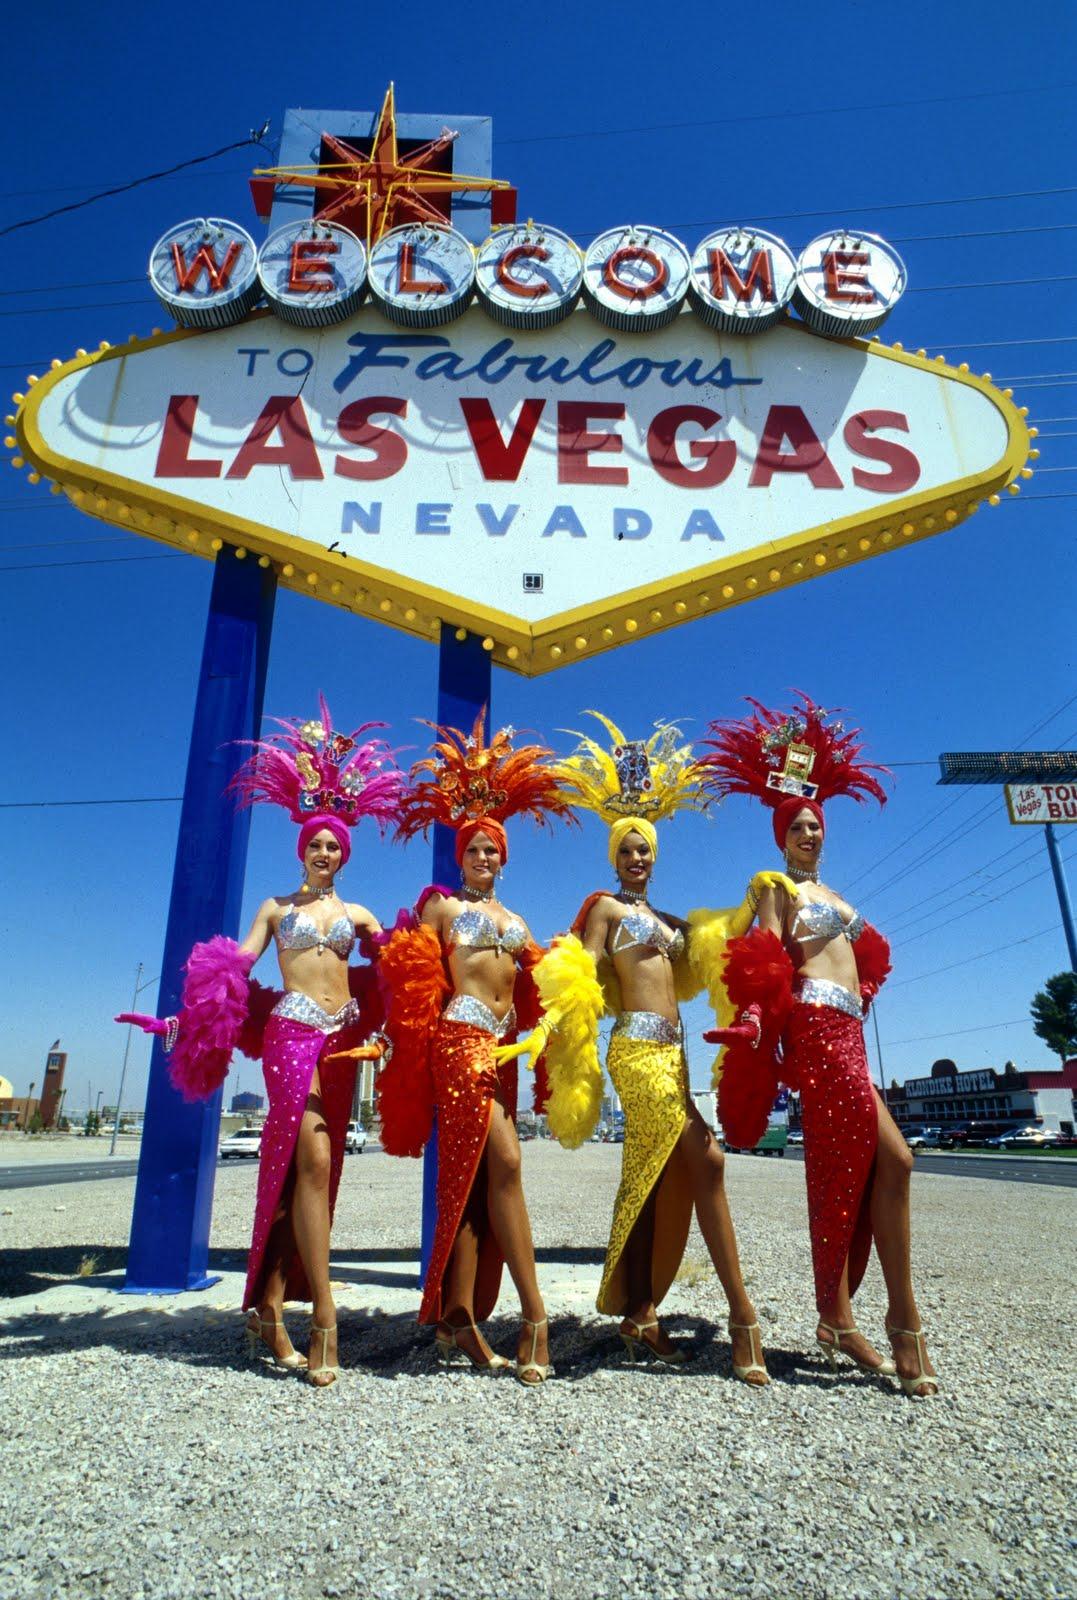 http://3.bp.blogspot.com/_l7LpkE0aML0/TCtl52tGKtI/AAAAAAAAAKk/5knZ0NOkpVY/s1600/Las_Vegas.jpg